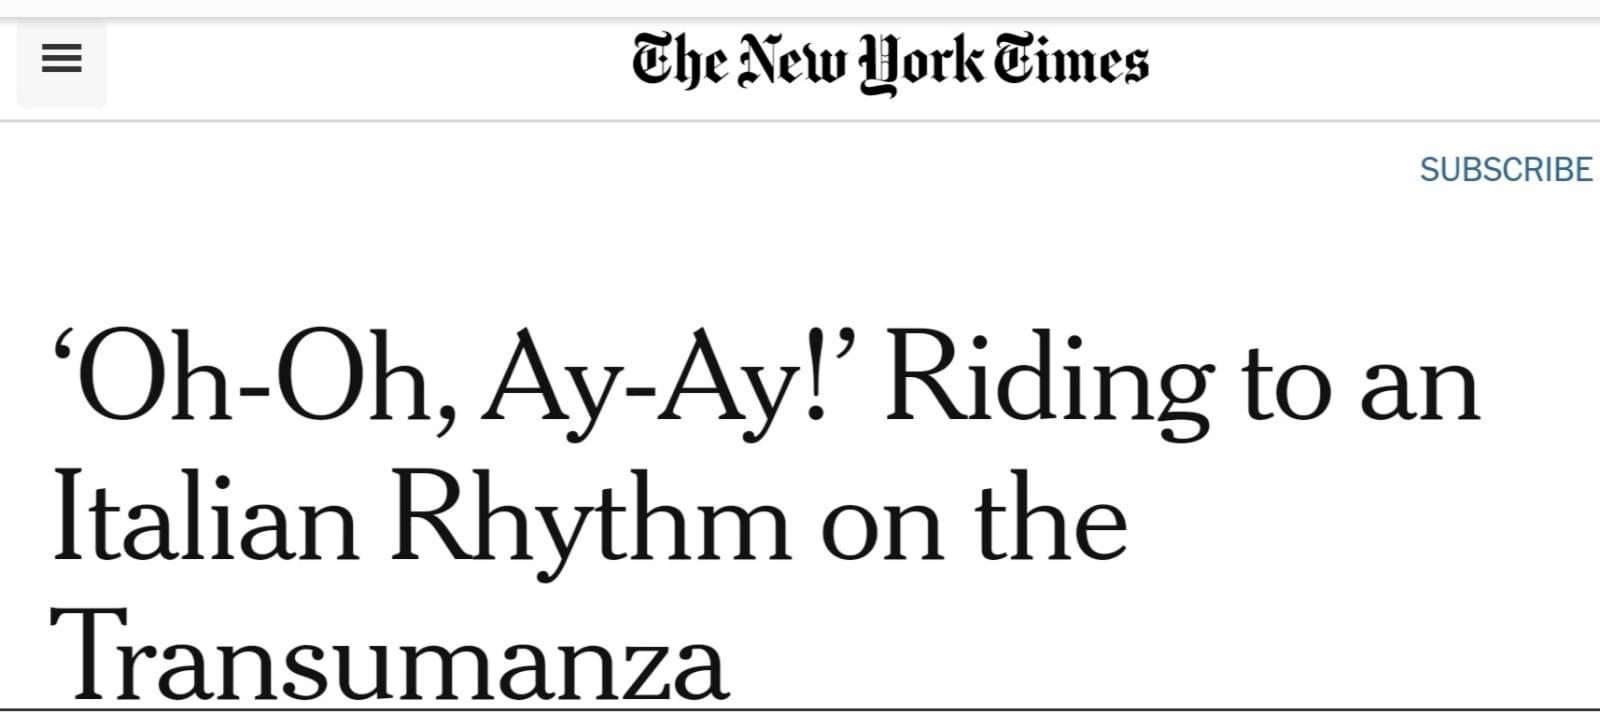 transumanza new york times